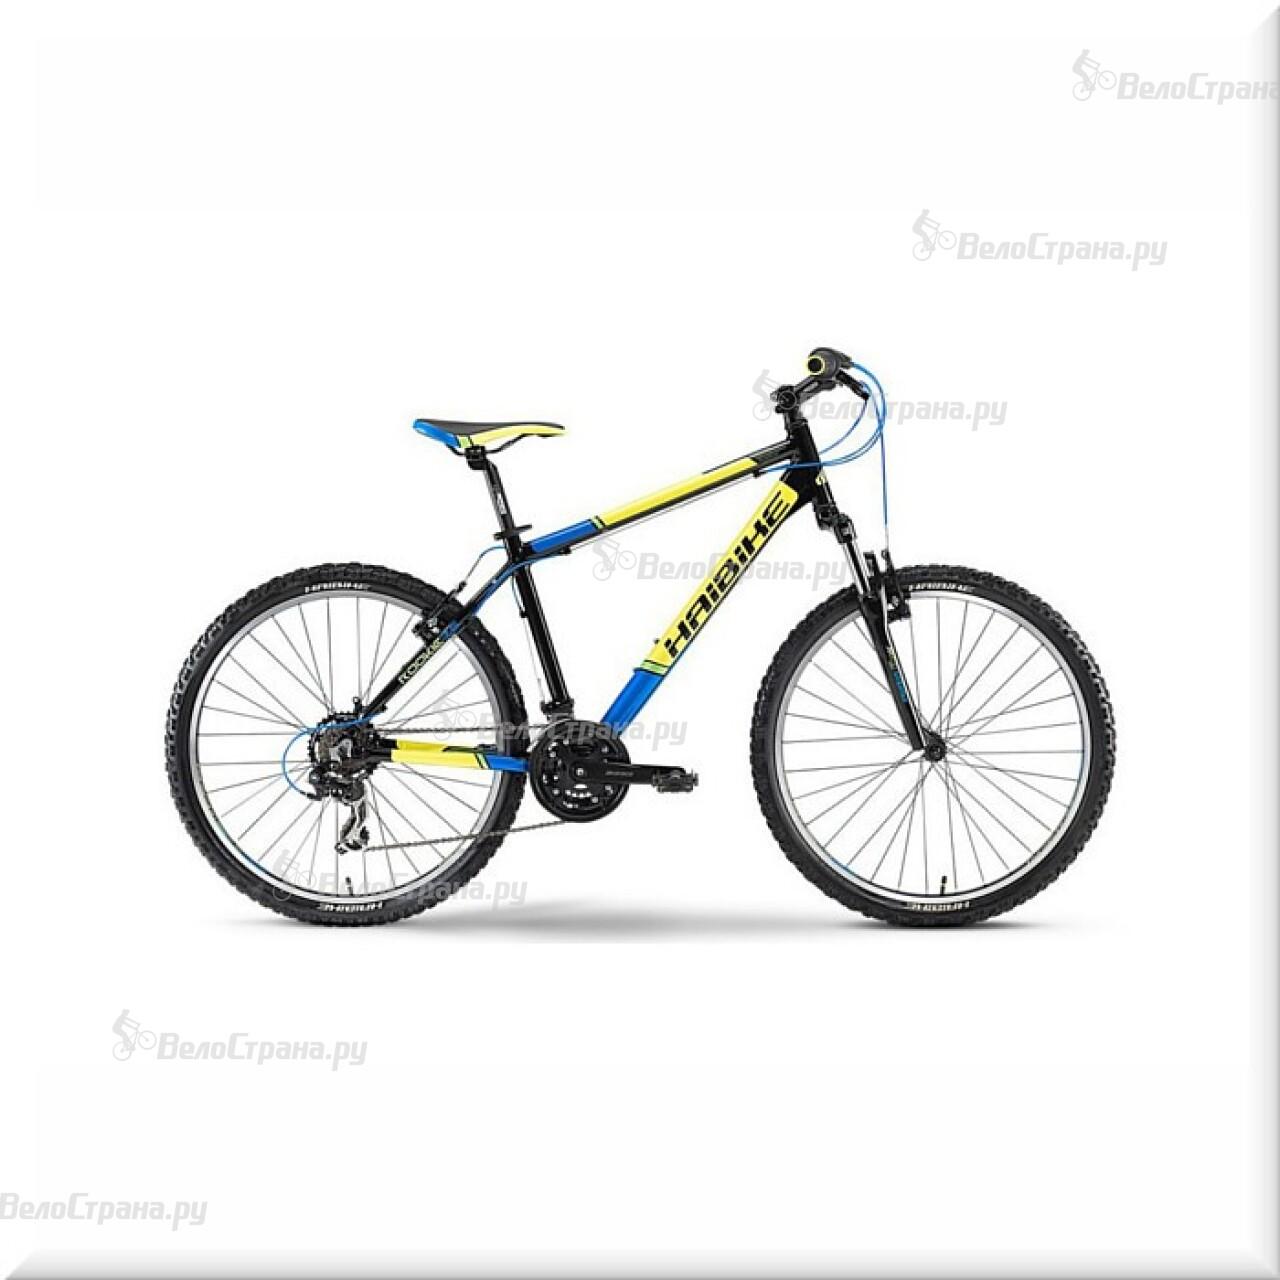 Велосипед Haibike Rookie (2014) все цены